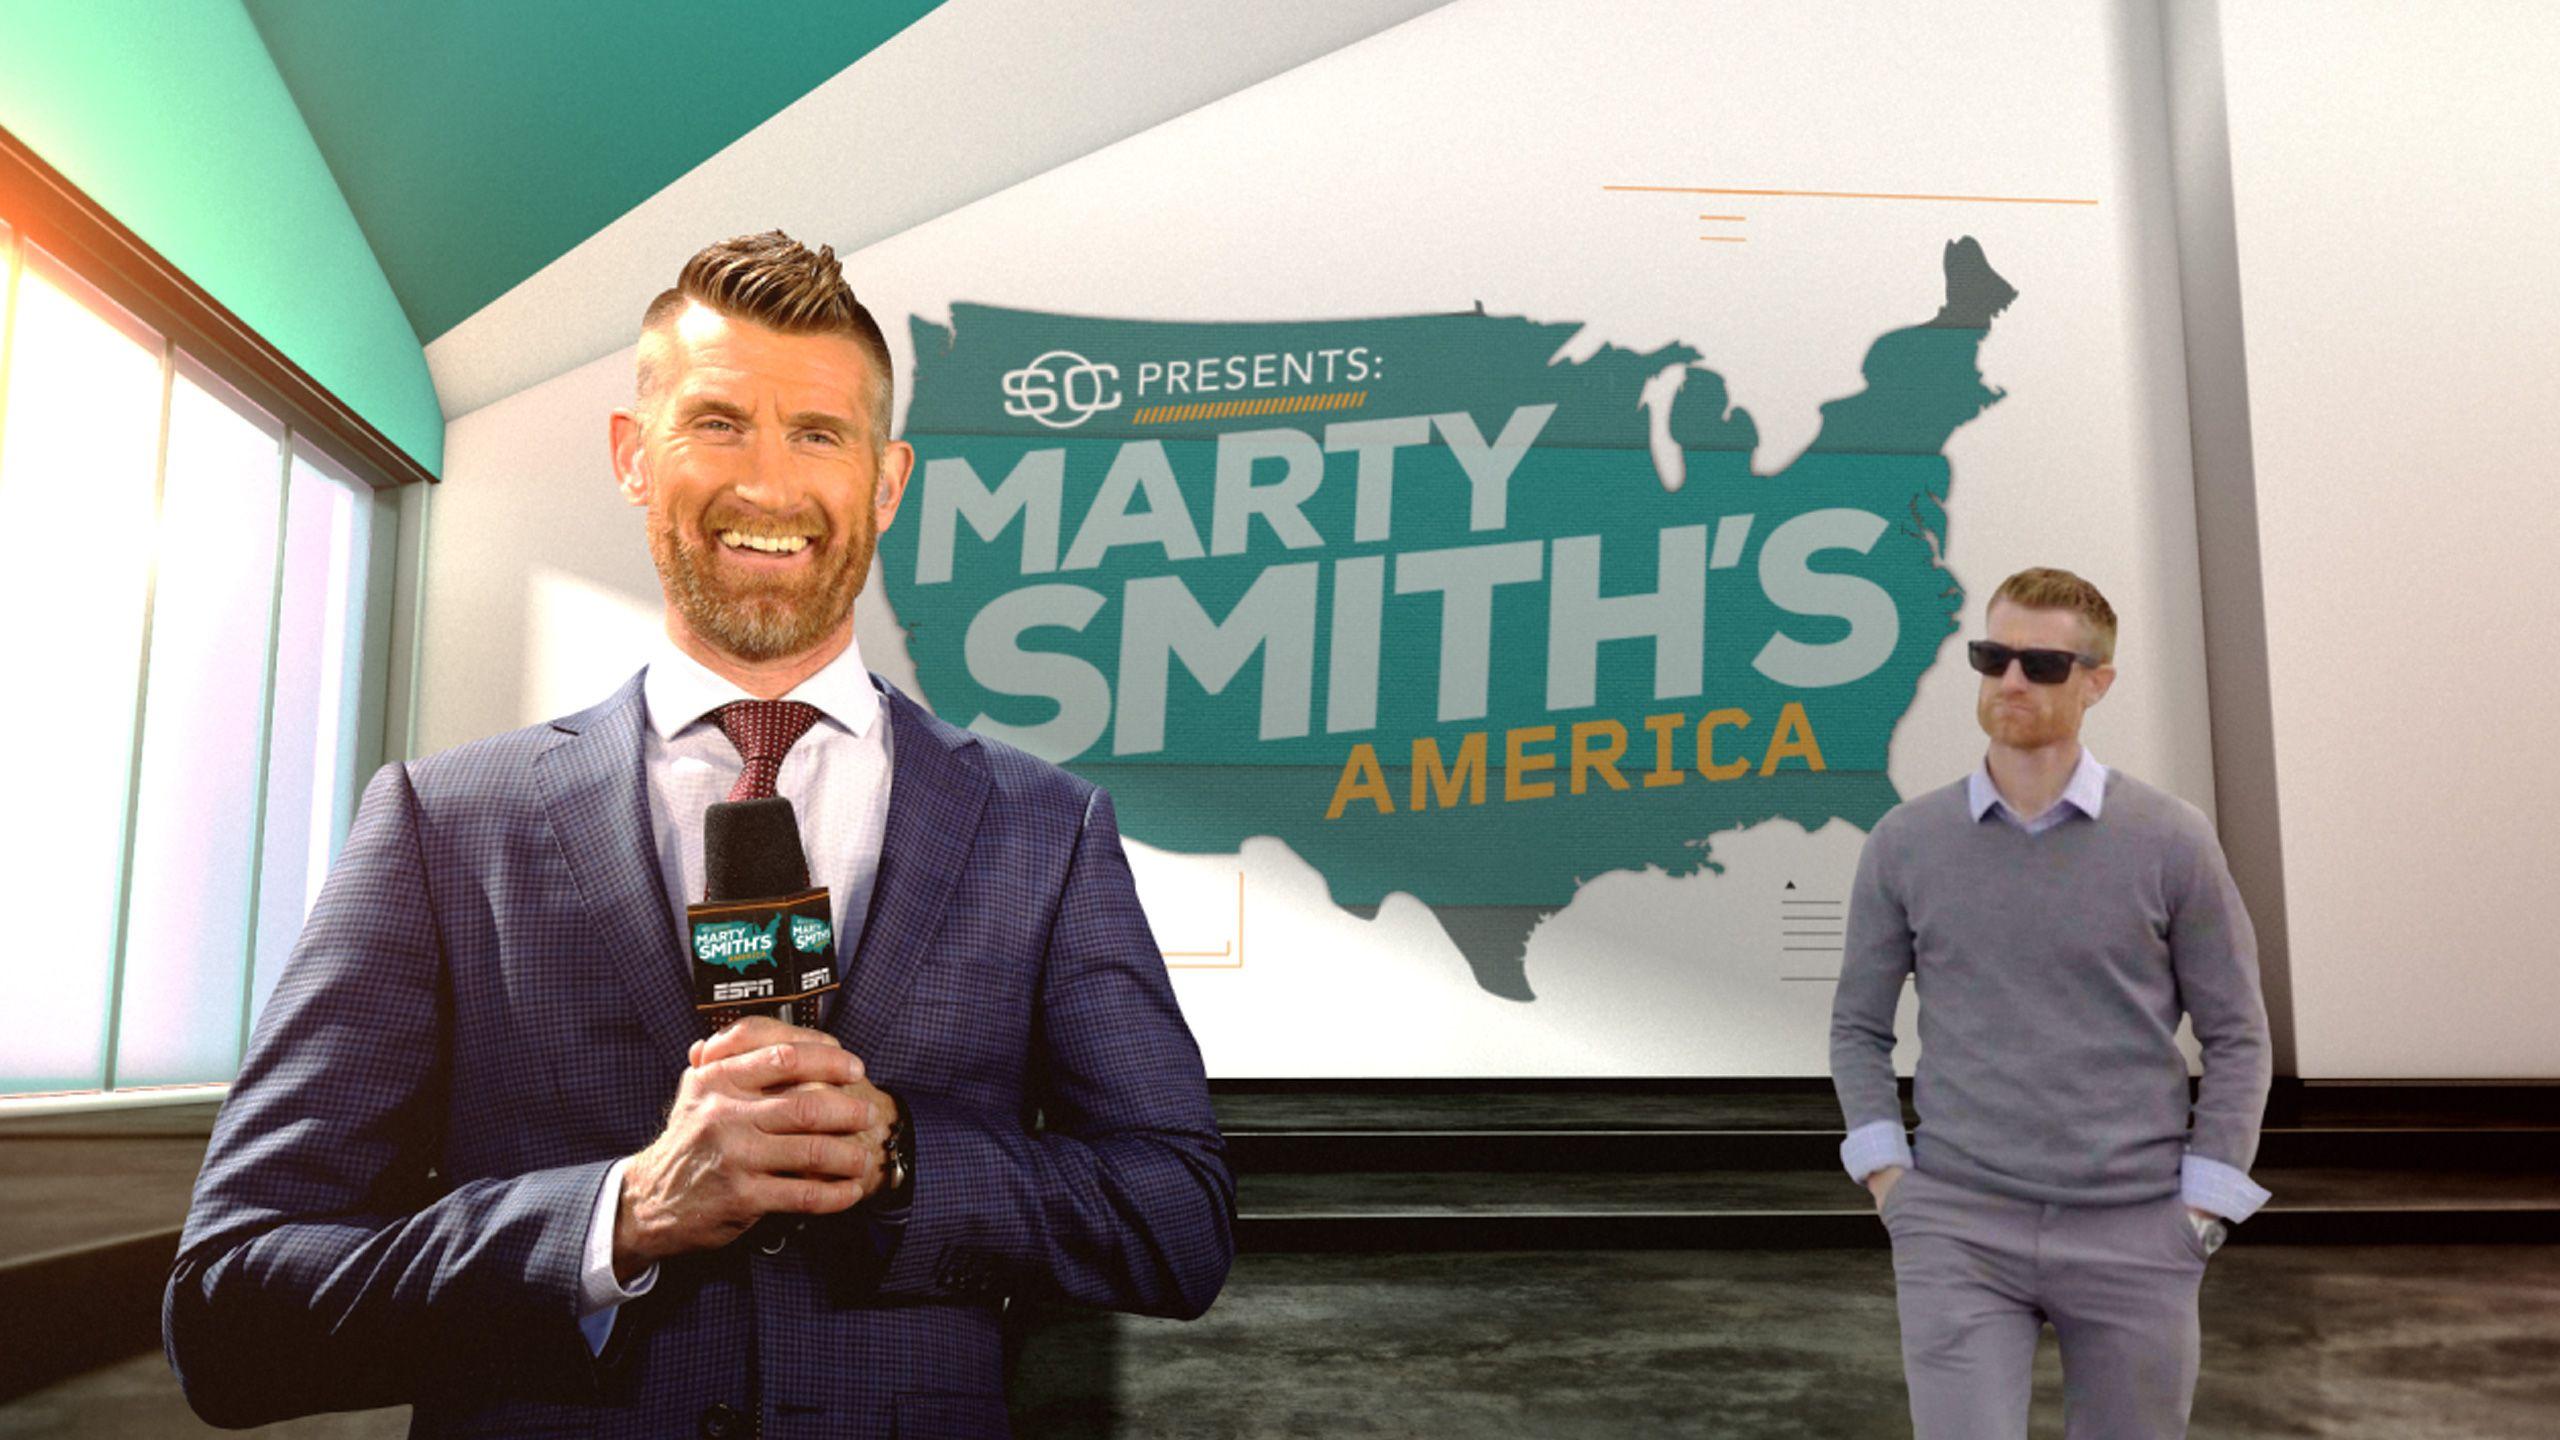 Marty Smith's America